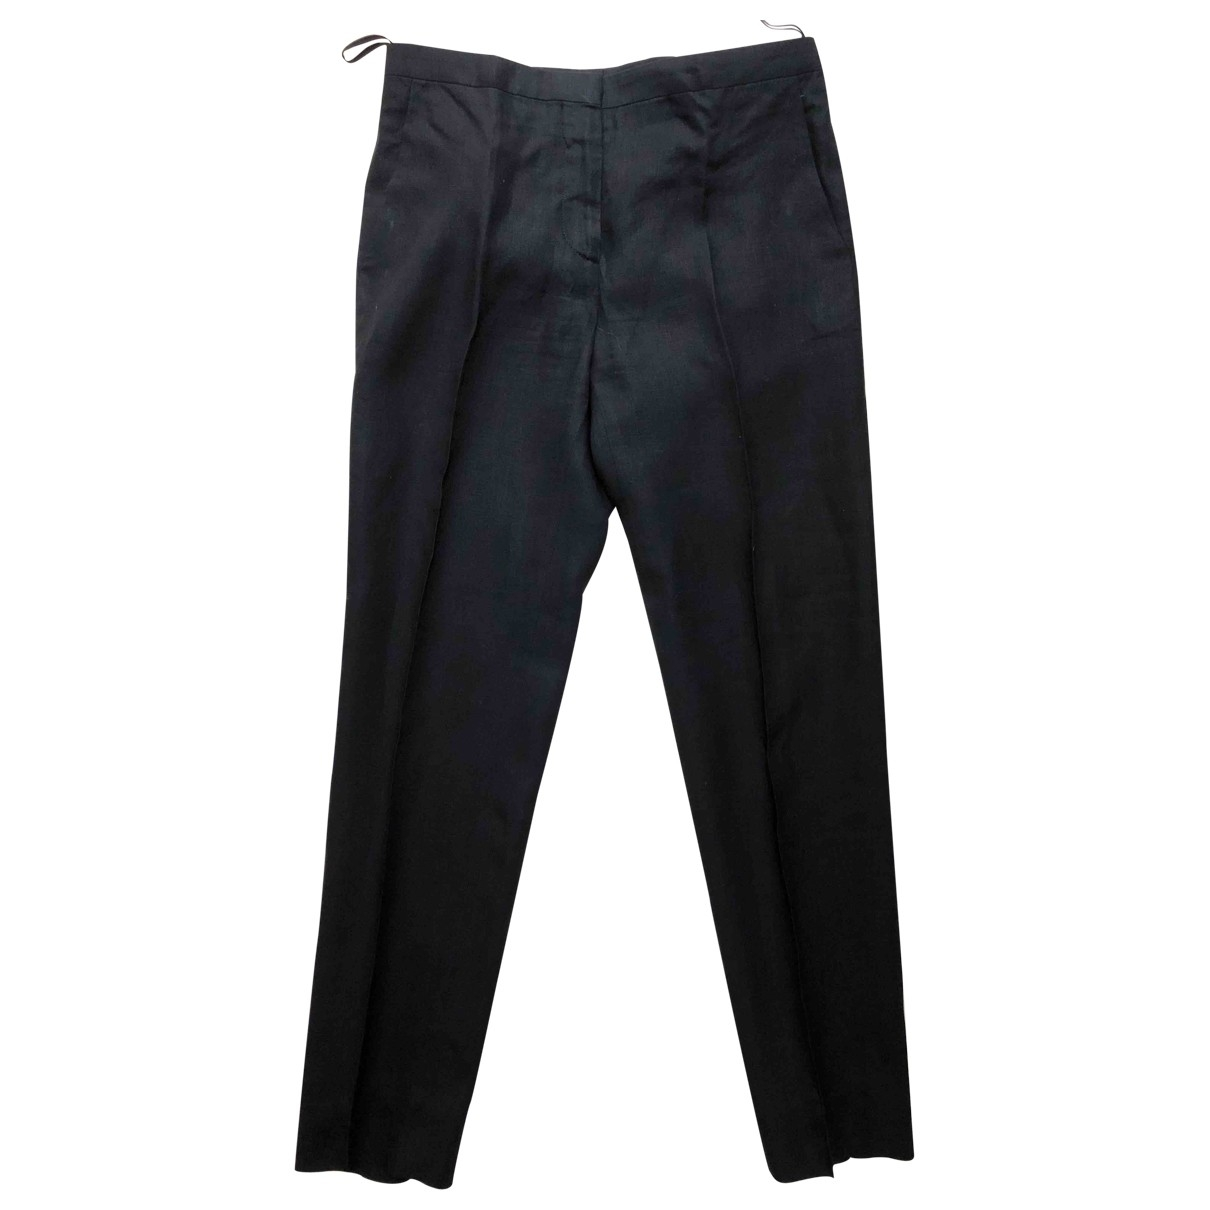 Prada - Pantalon   pour femme en lin - noir